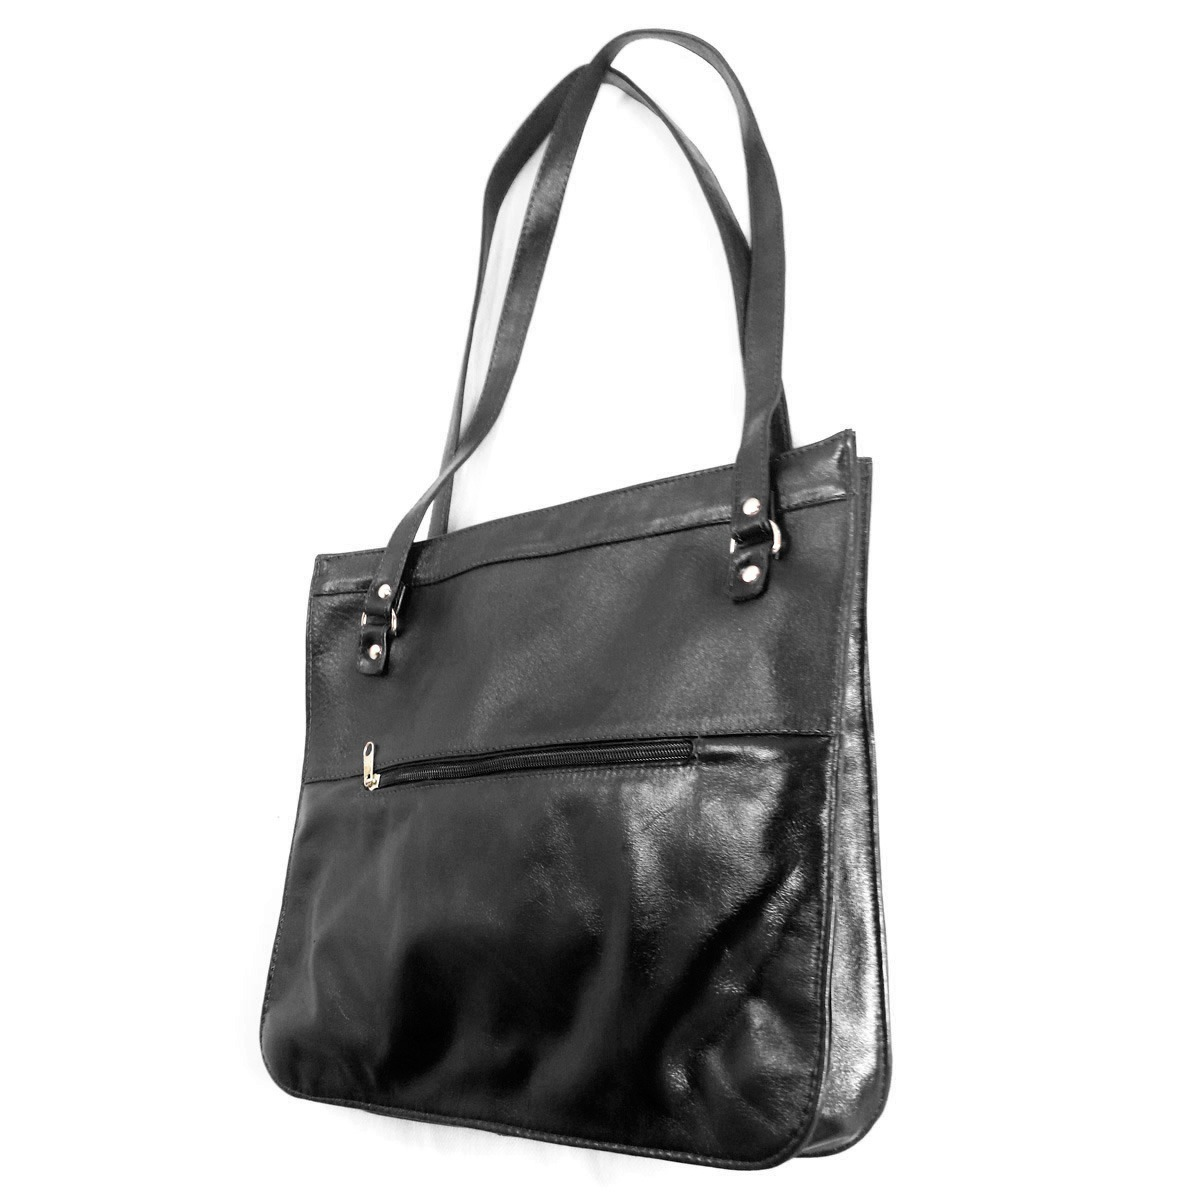 e8da2271a bolsa feminina couro legítimo tiracolo transversal elegante. Carregando  zoom.